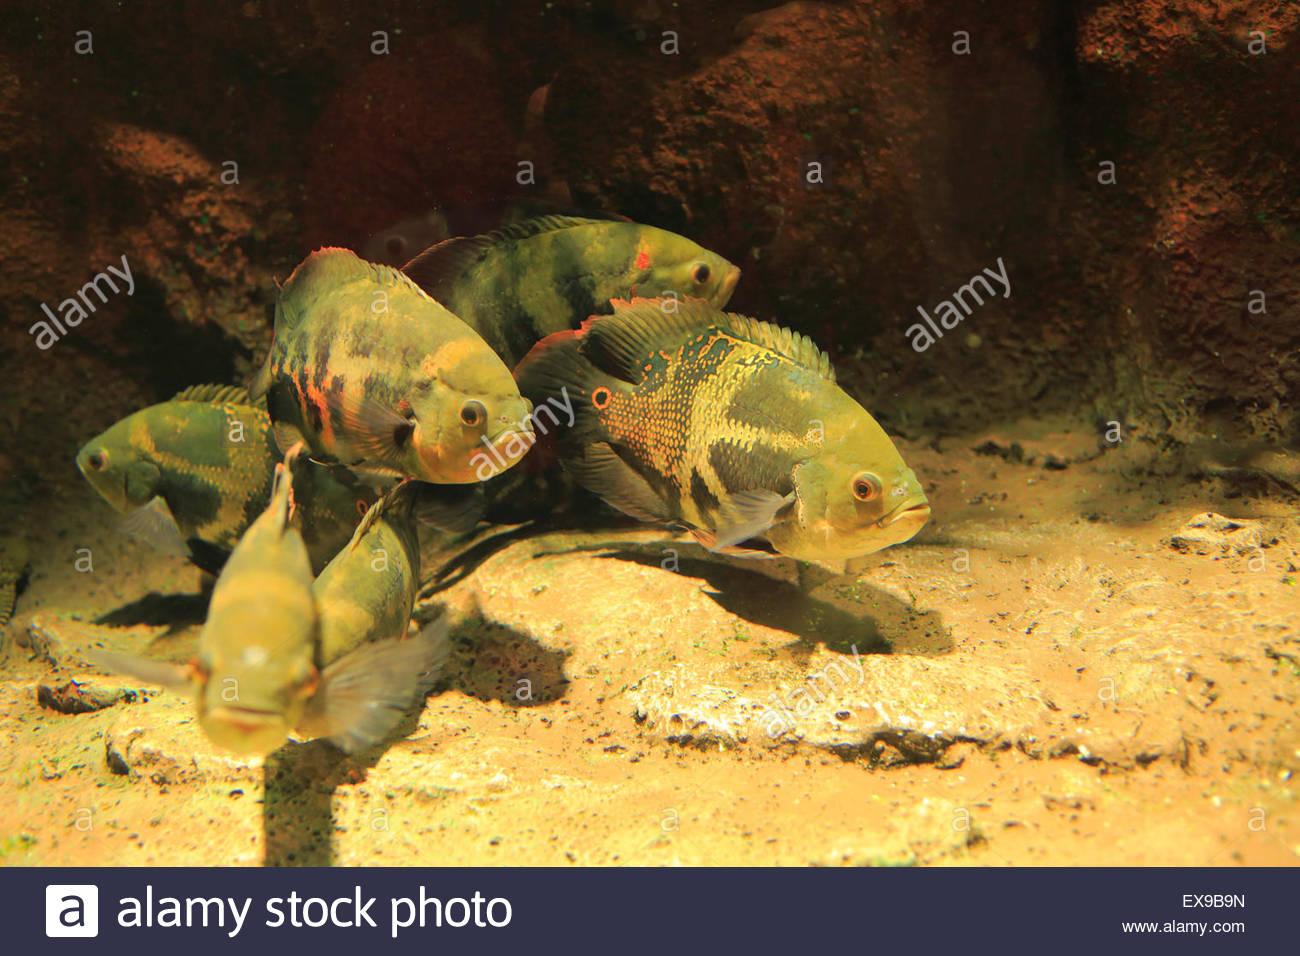 Japan, Hokkaido, Kitami, Oscar Schwimmen im Aquarium, close-up. Stockbild